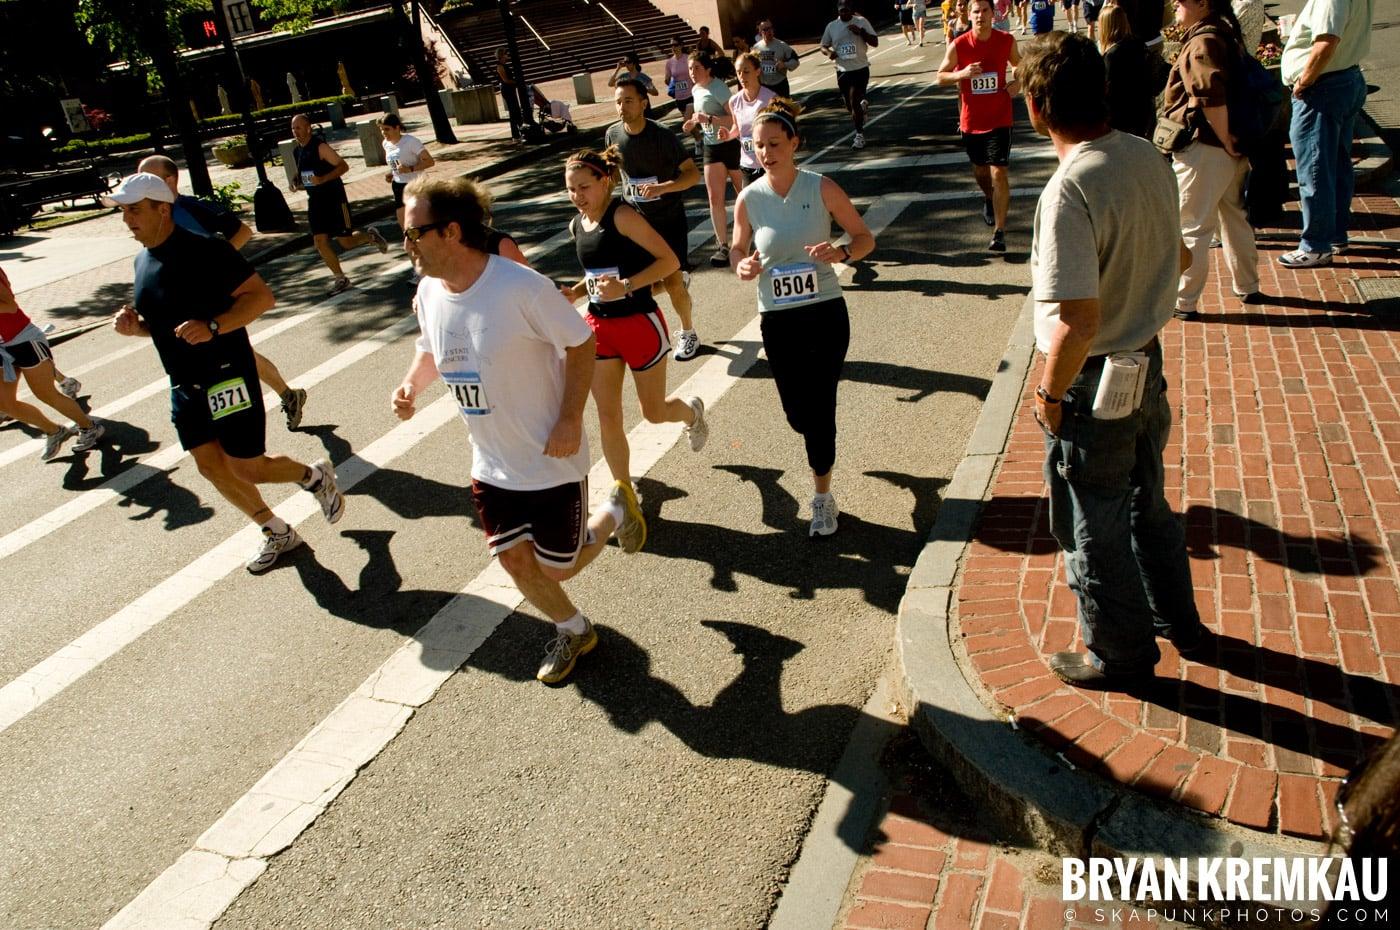 Memorial Day Weekend Trip to Boston - 5.25.08 (45)